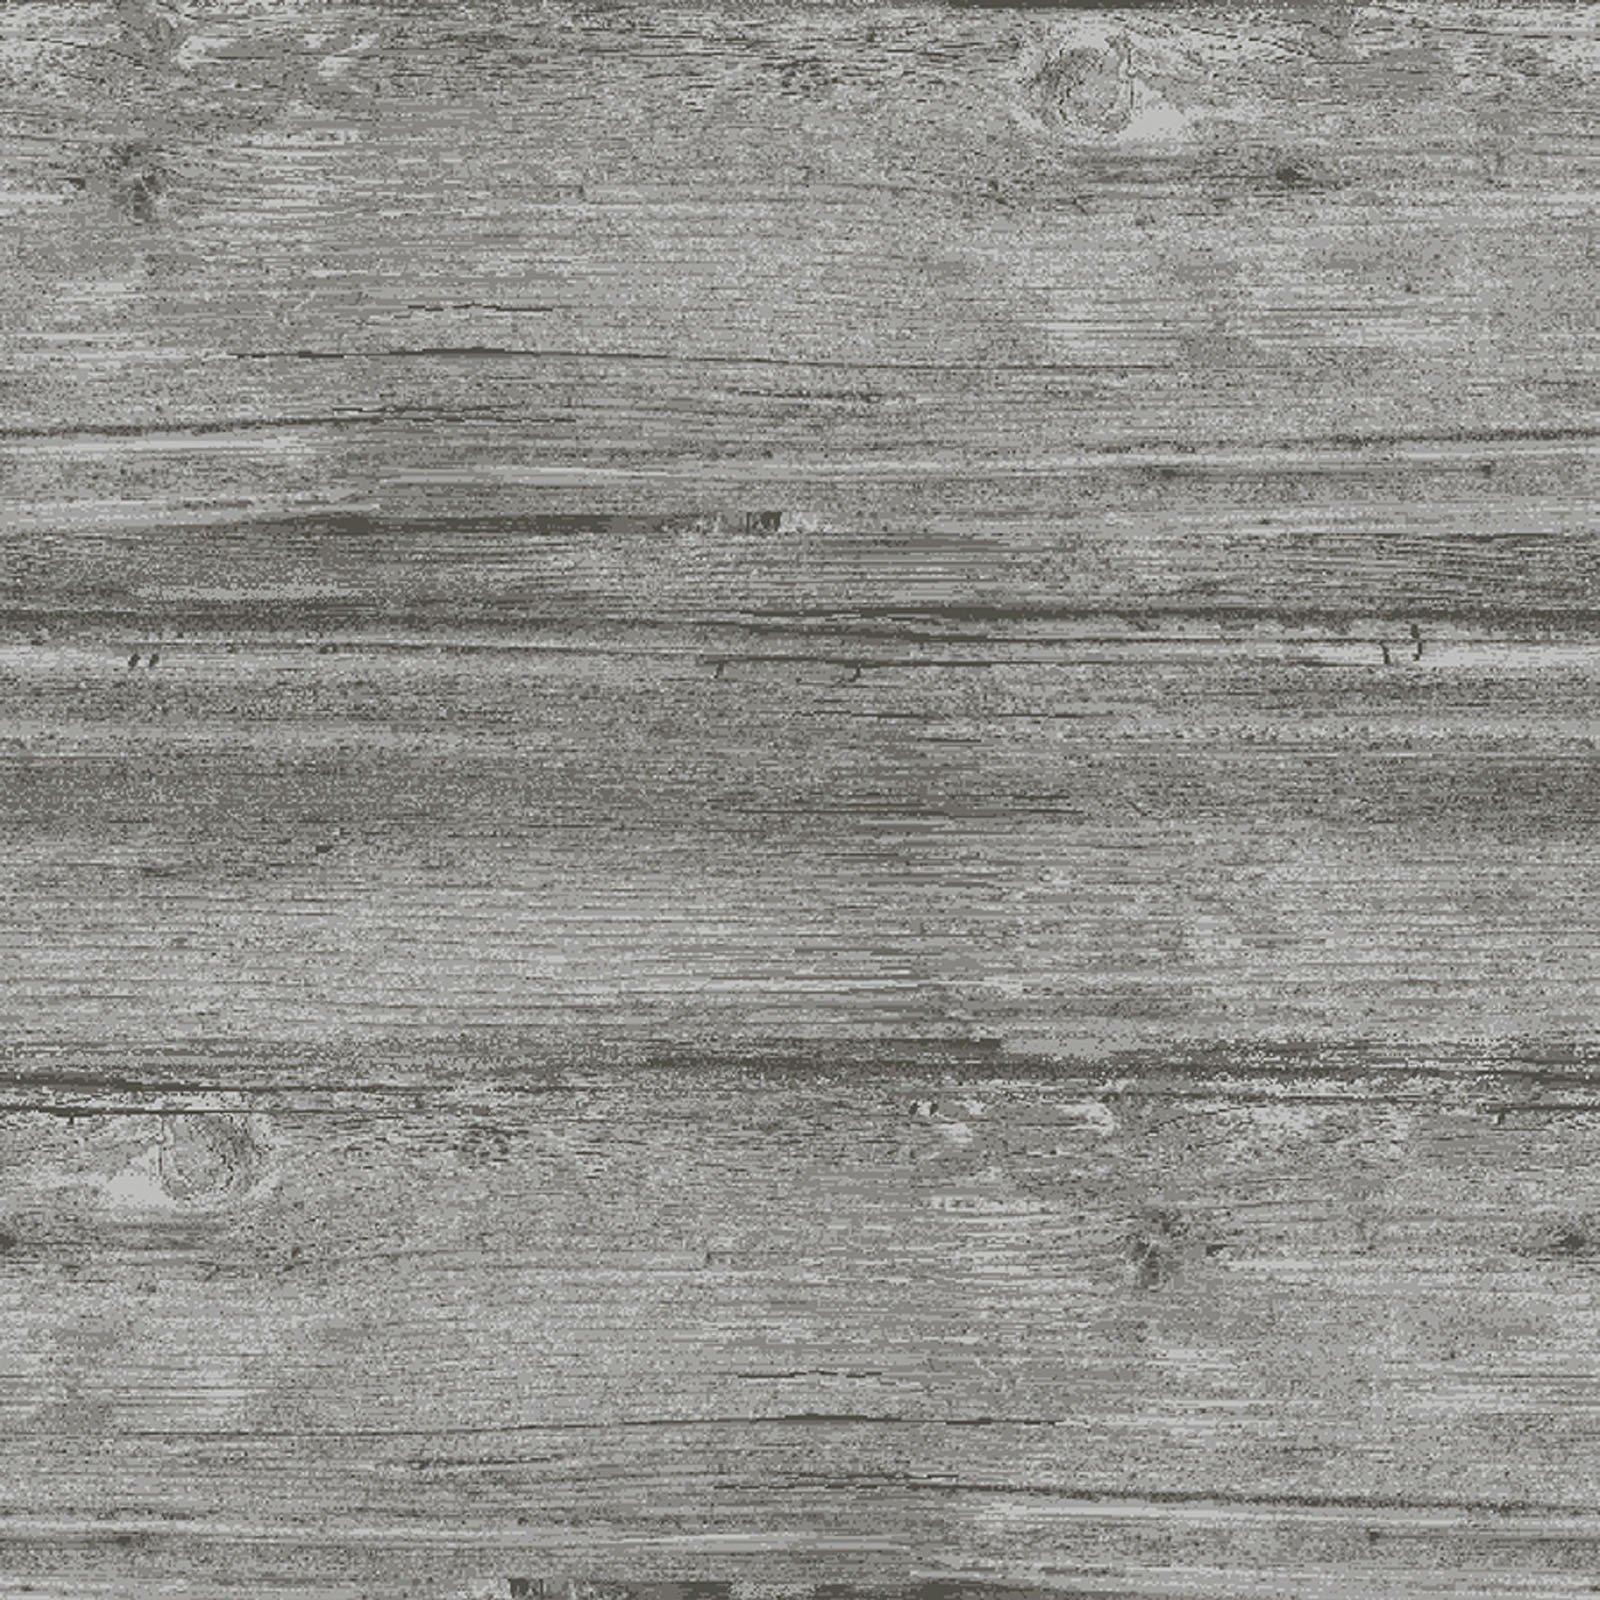 Faux Texture - Charcoal<br/>Contempo 7709-13